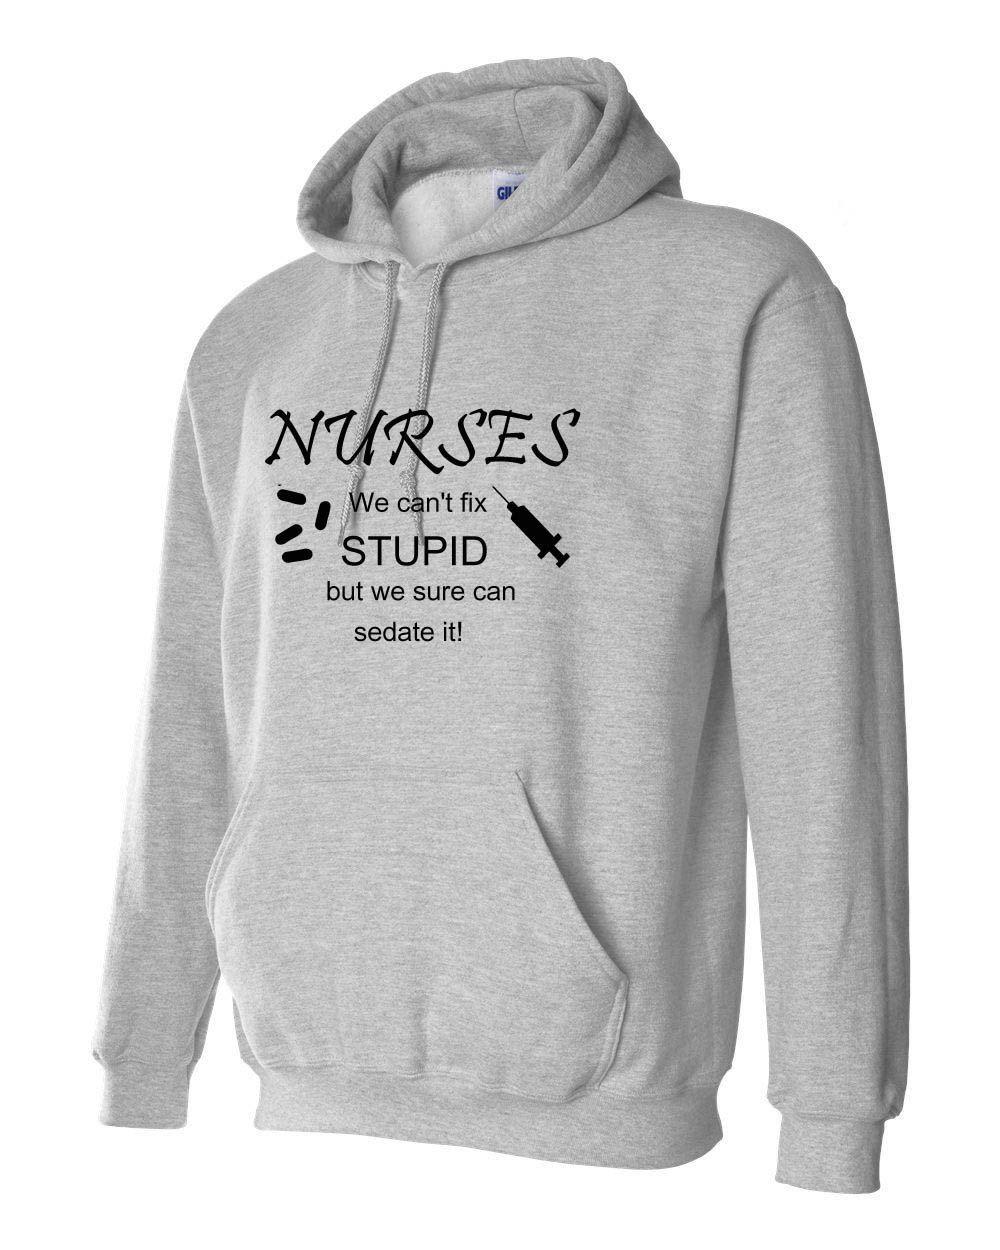 d81416a45fa6f NURSE We can't fix stupid but we can sedate it Nursing Hoodie Sweatshirt s  m L xL 2Xl 3Xl Hoody Hooded sweater Priority Shipping by mystoryshirts on  Etsy